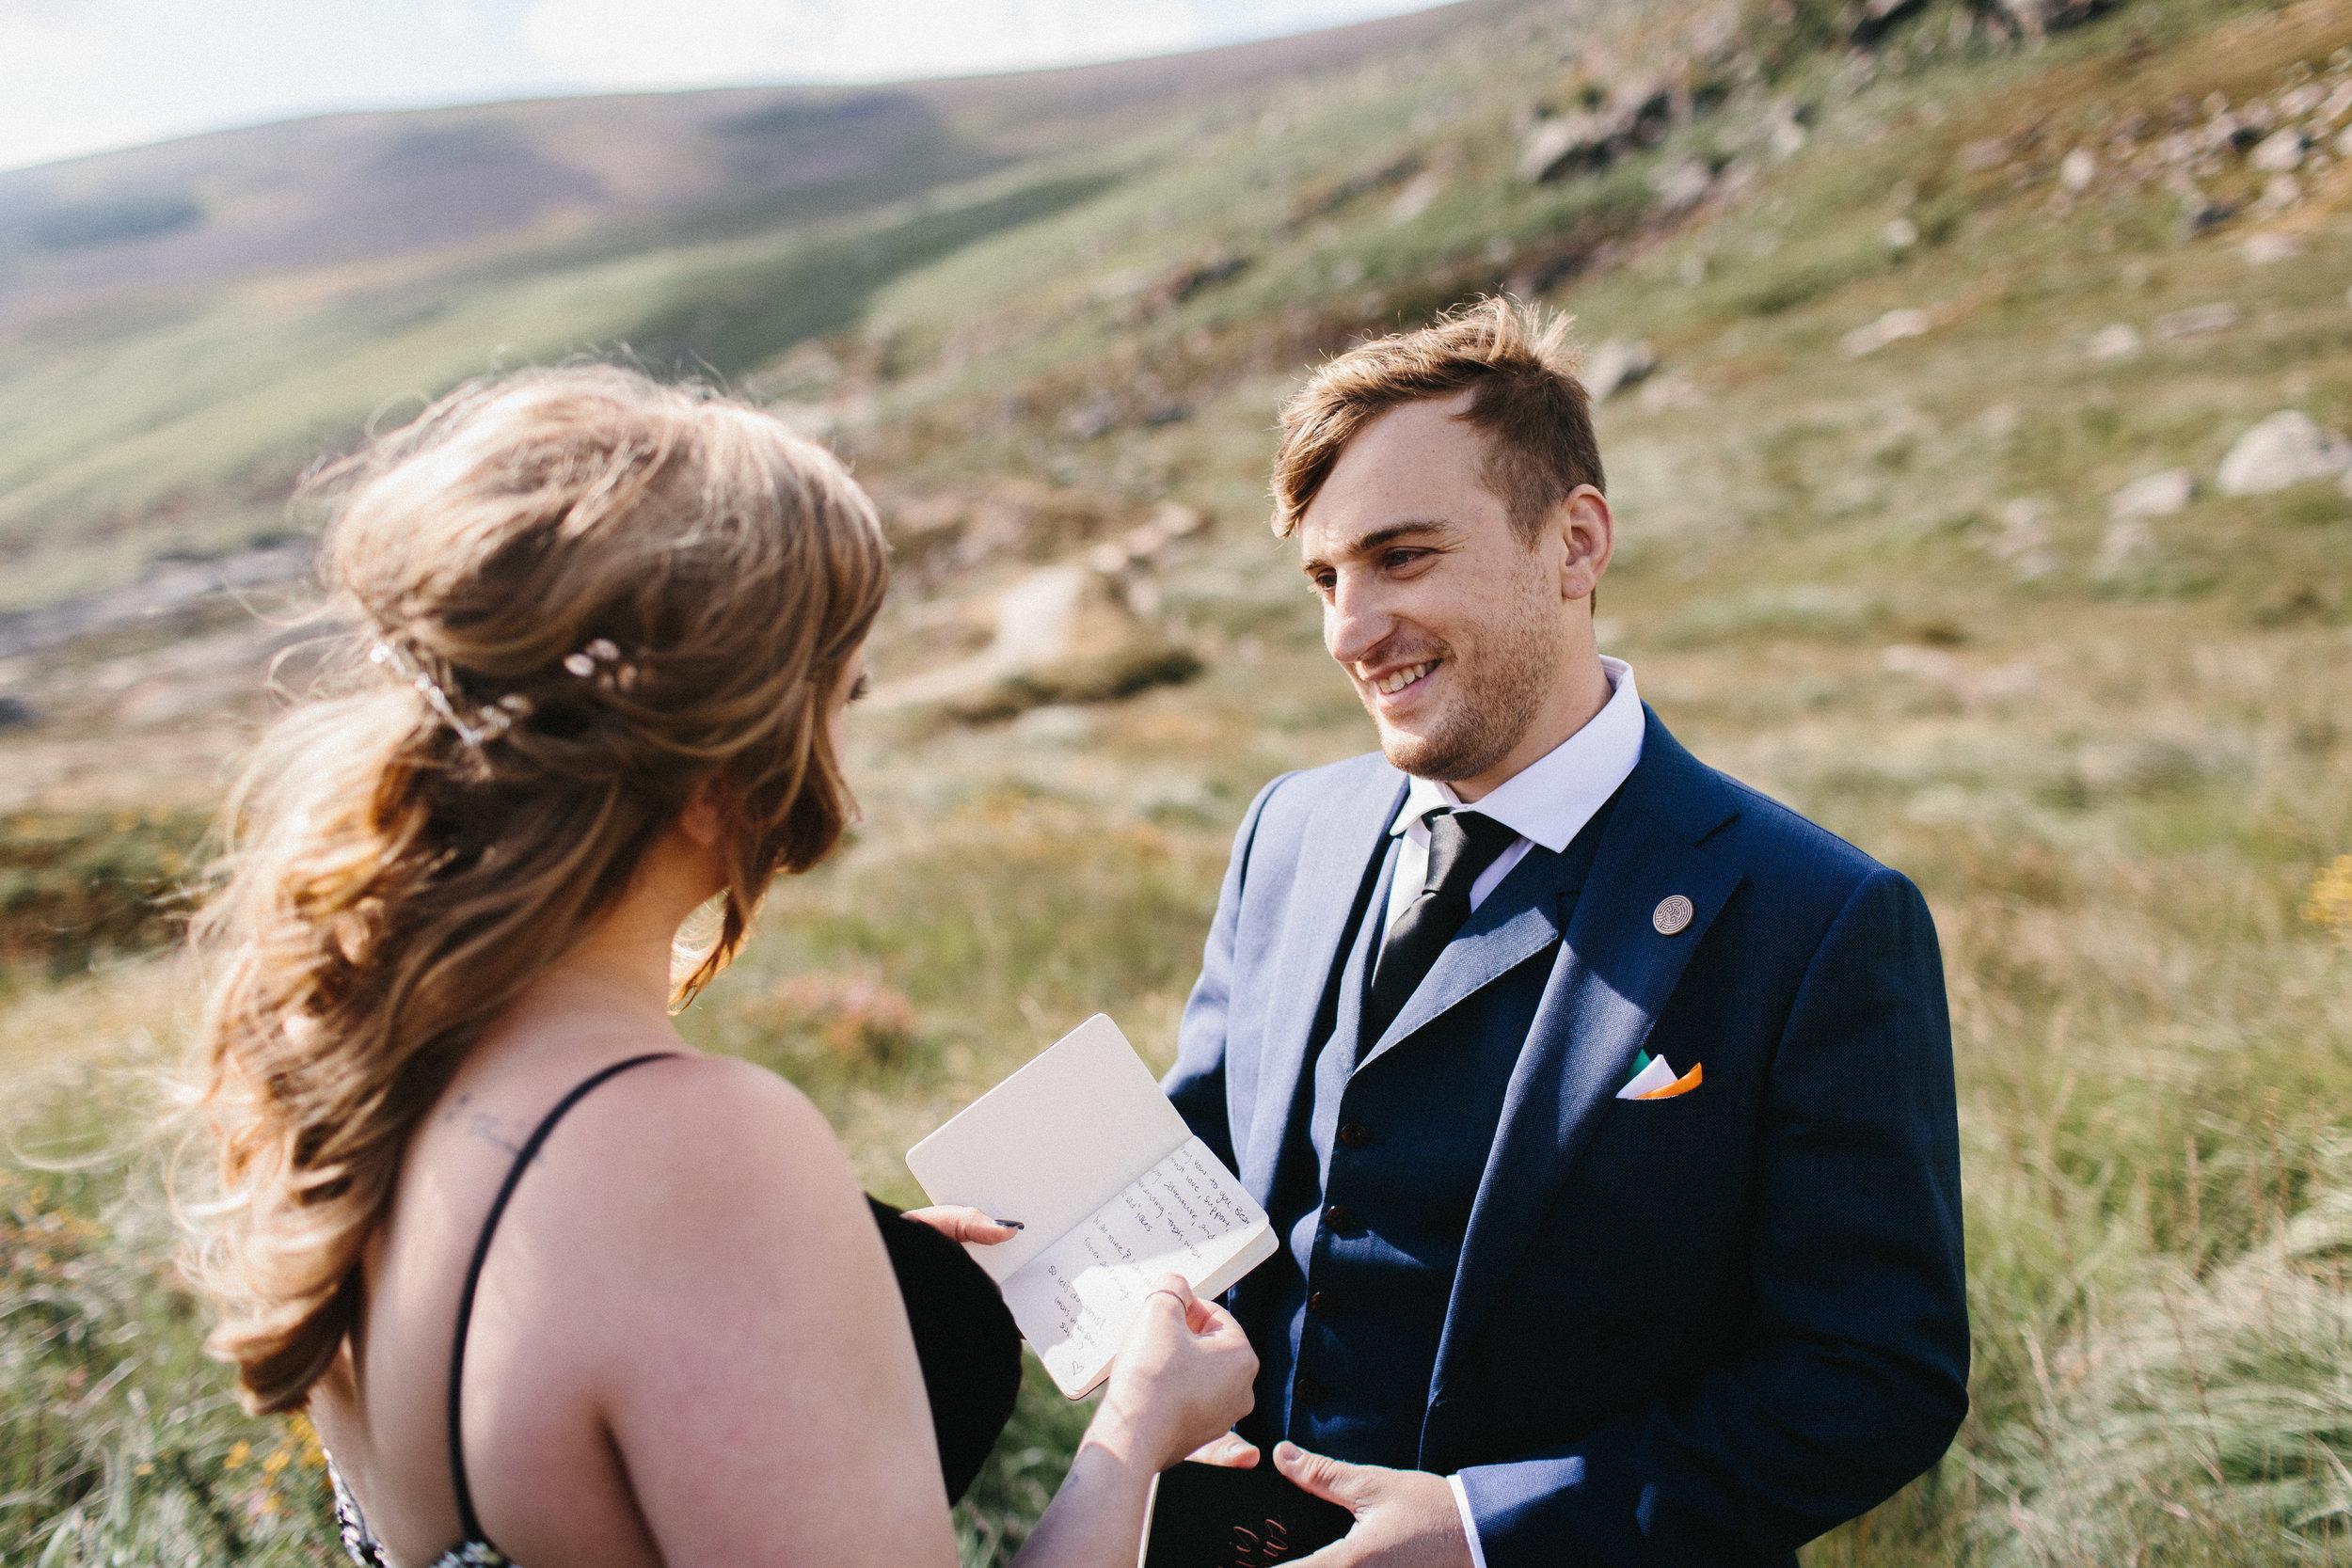 ireland_elopement_black_wedding_dress_wicklow_glendalough_athy_st_kevins_way_1197.jpg